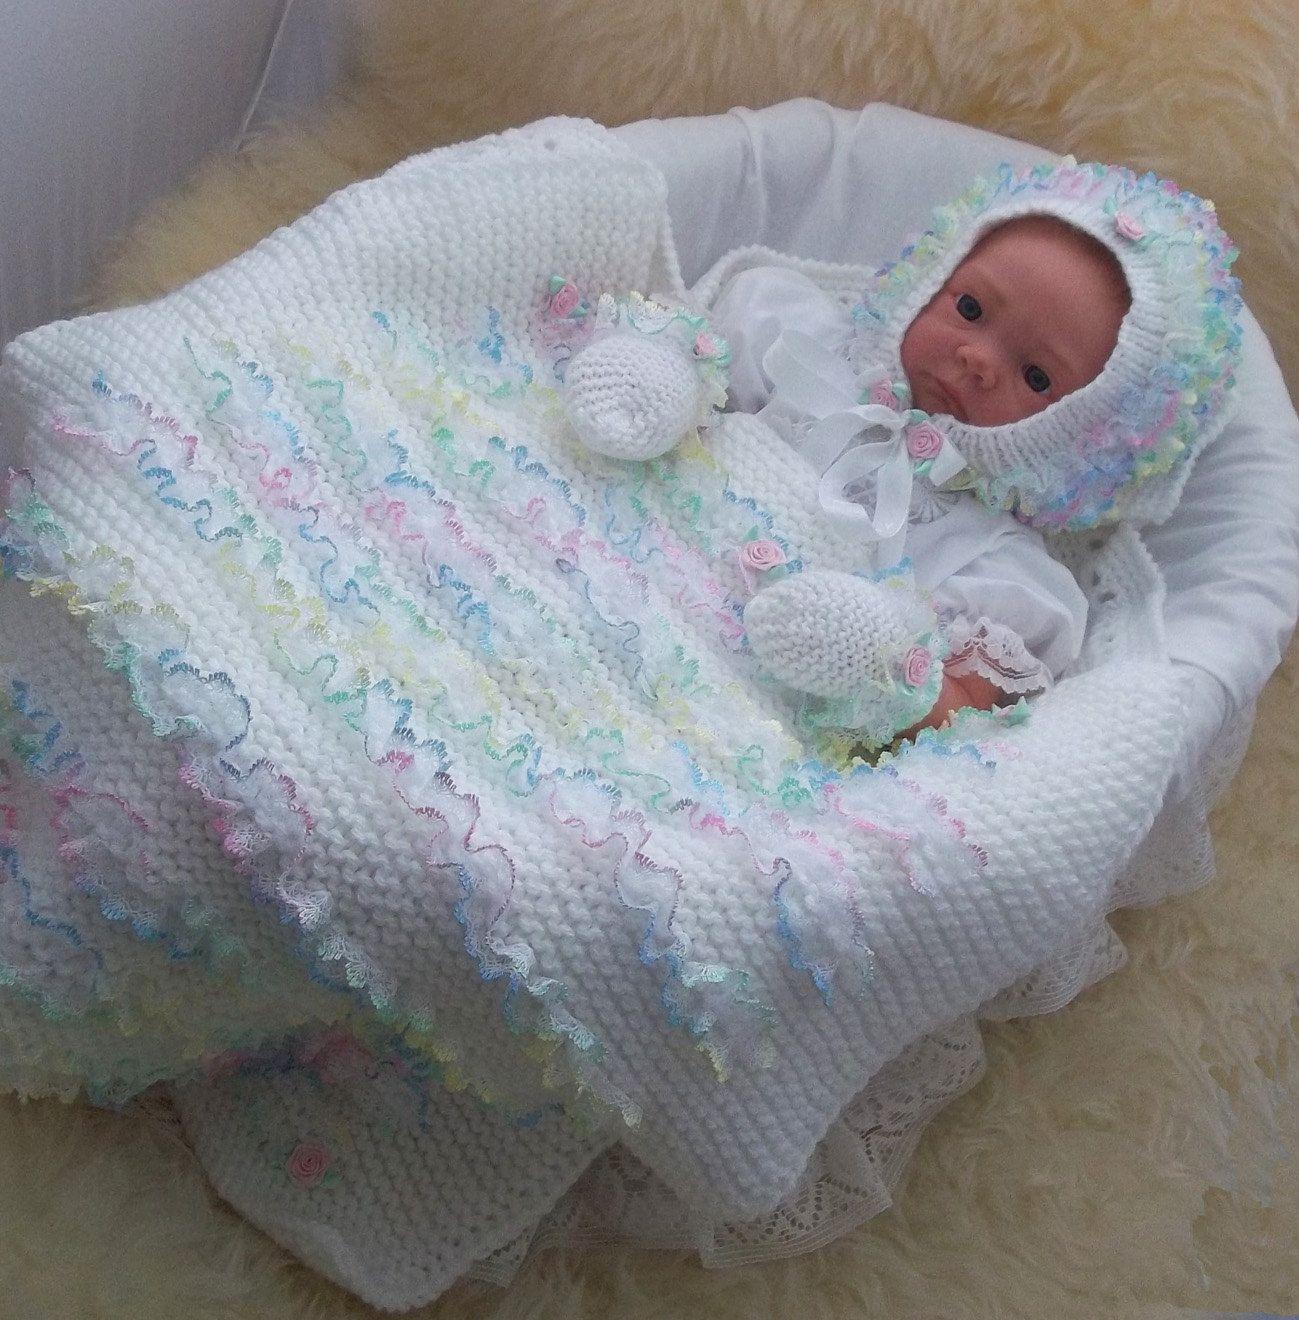 Knitting pattern baby girls lace pram blanket bonnet mittens knitting pattern baby girls lace pram blanket bonnet mittens easy knit download pdf bankloansurffo Gallery